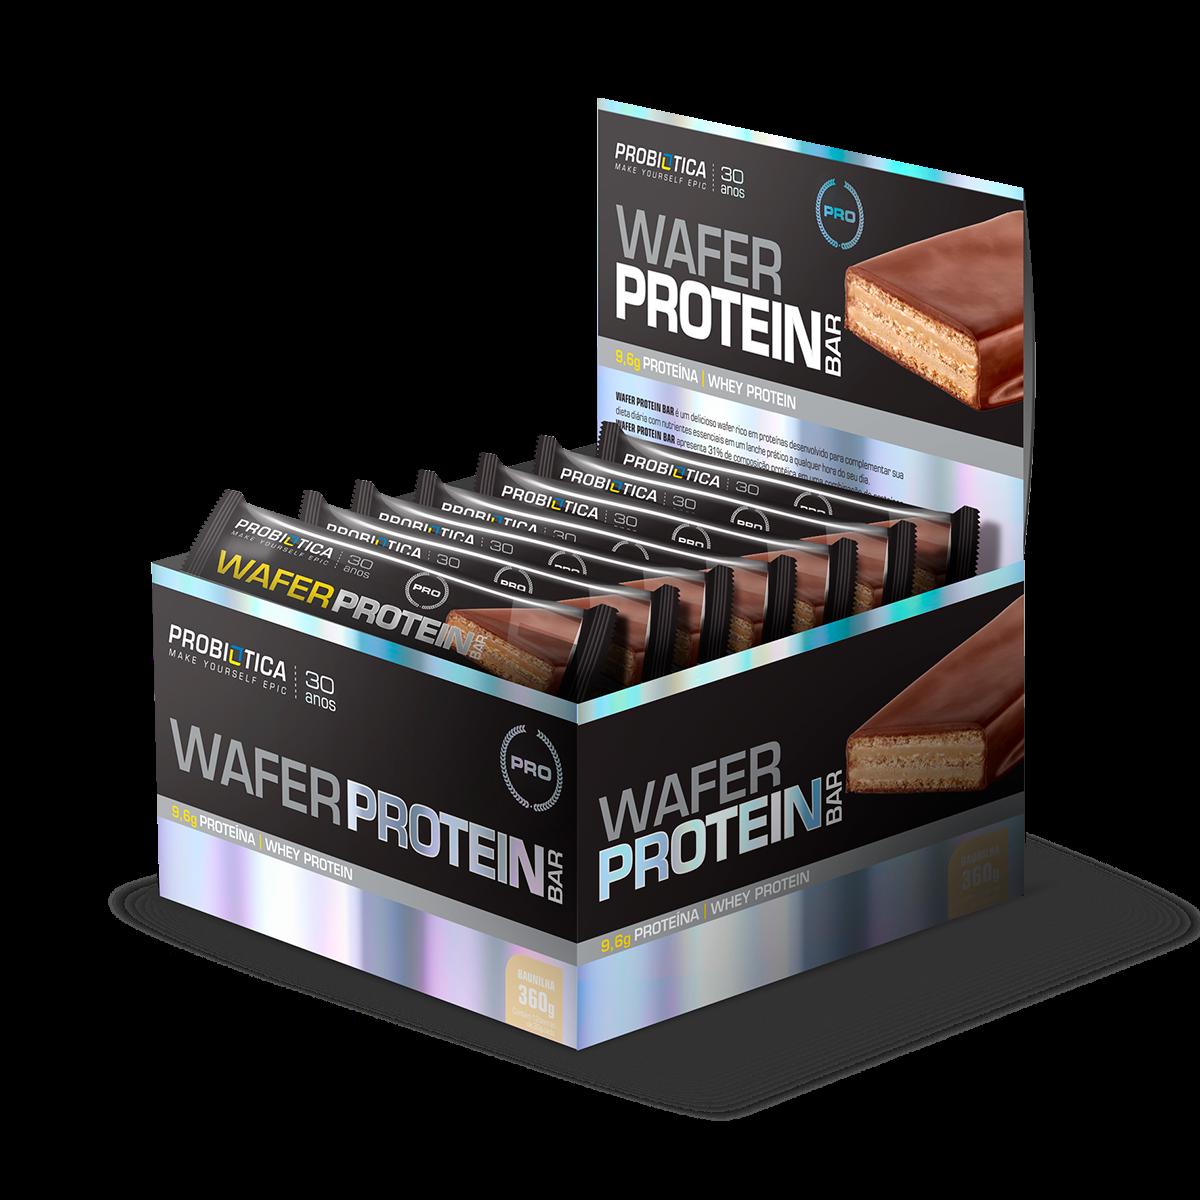 b590c9472 Wafer Protein Bar Probiótica - Loja do Suplemento